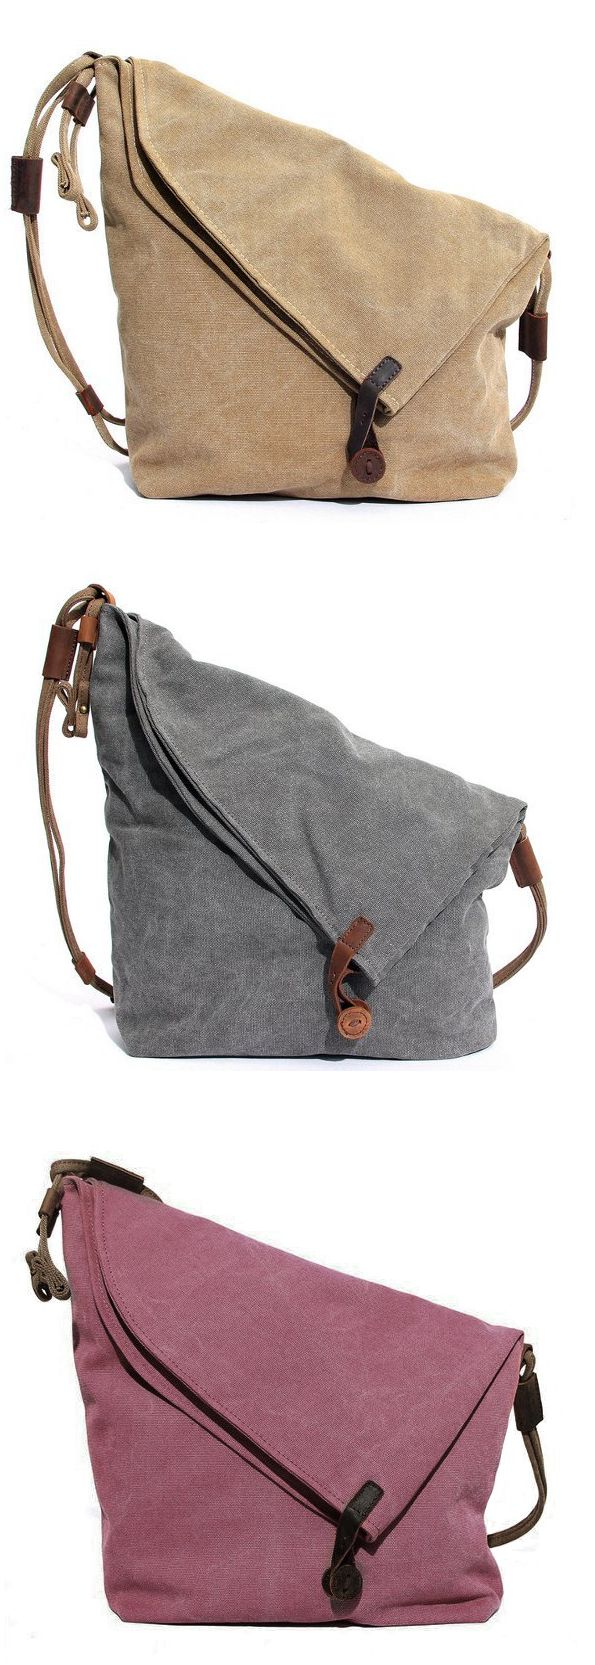 US$38.65 Women Vintage Messenger Bag Genuine Leather Canvas Crossbody Bag Tribal Rucksack